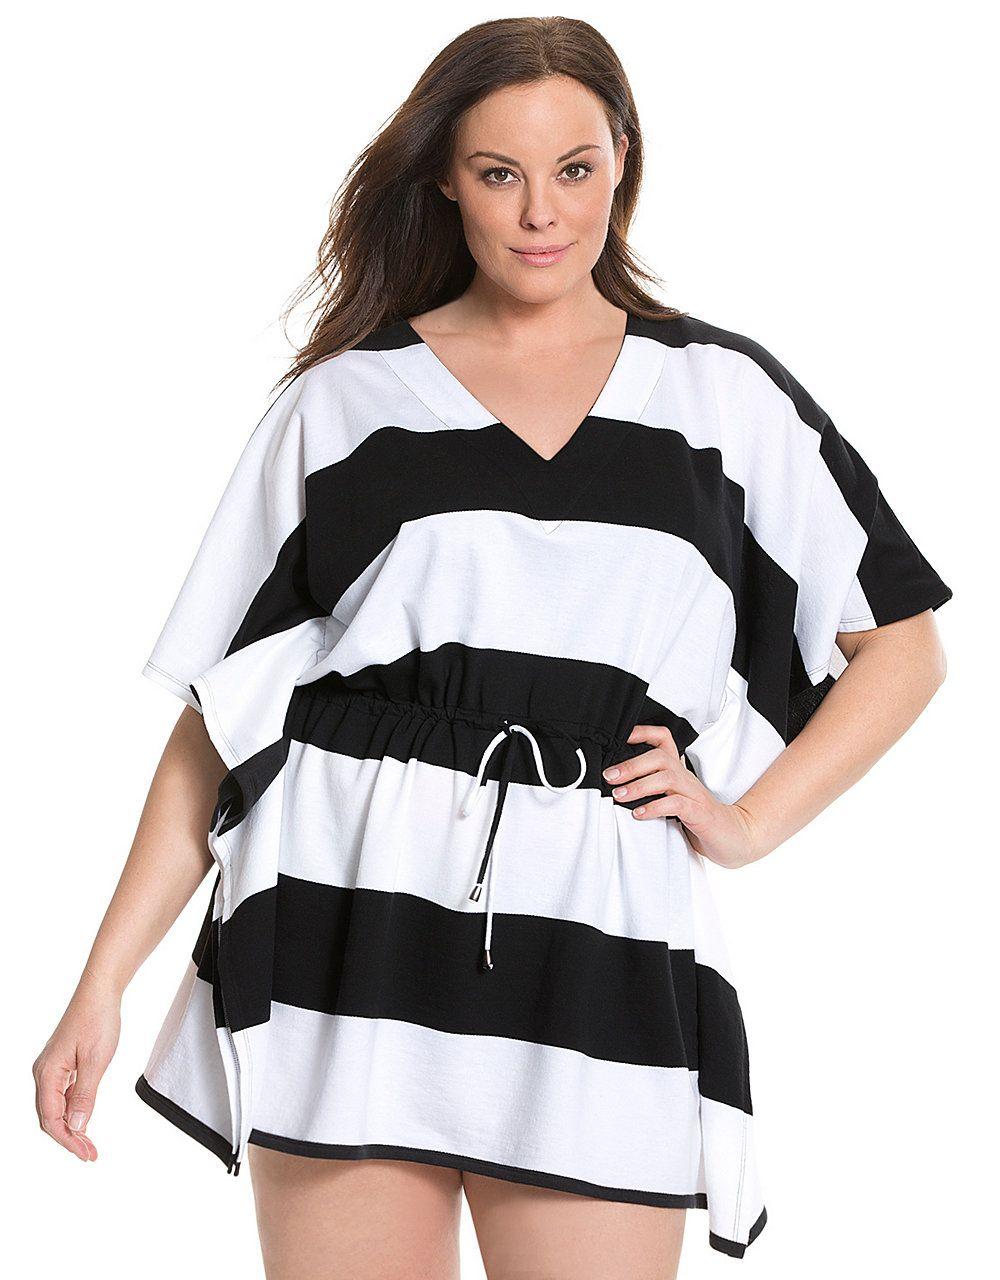 cb0365908b Black and white top. 6th & Lane striped swim cover up by Lane Bryant | Lane  Bryant